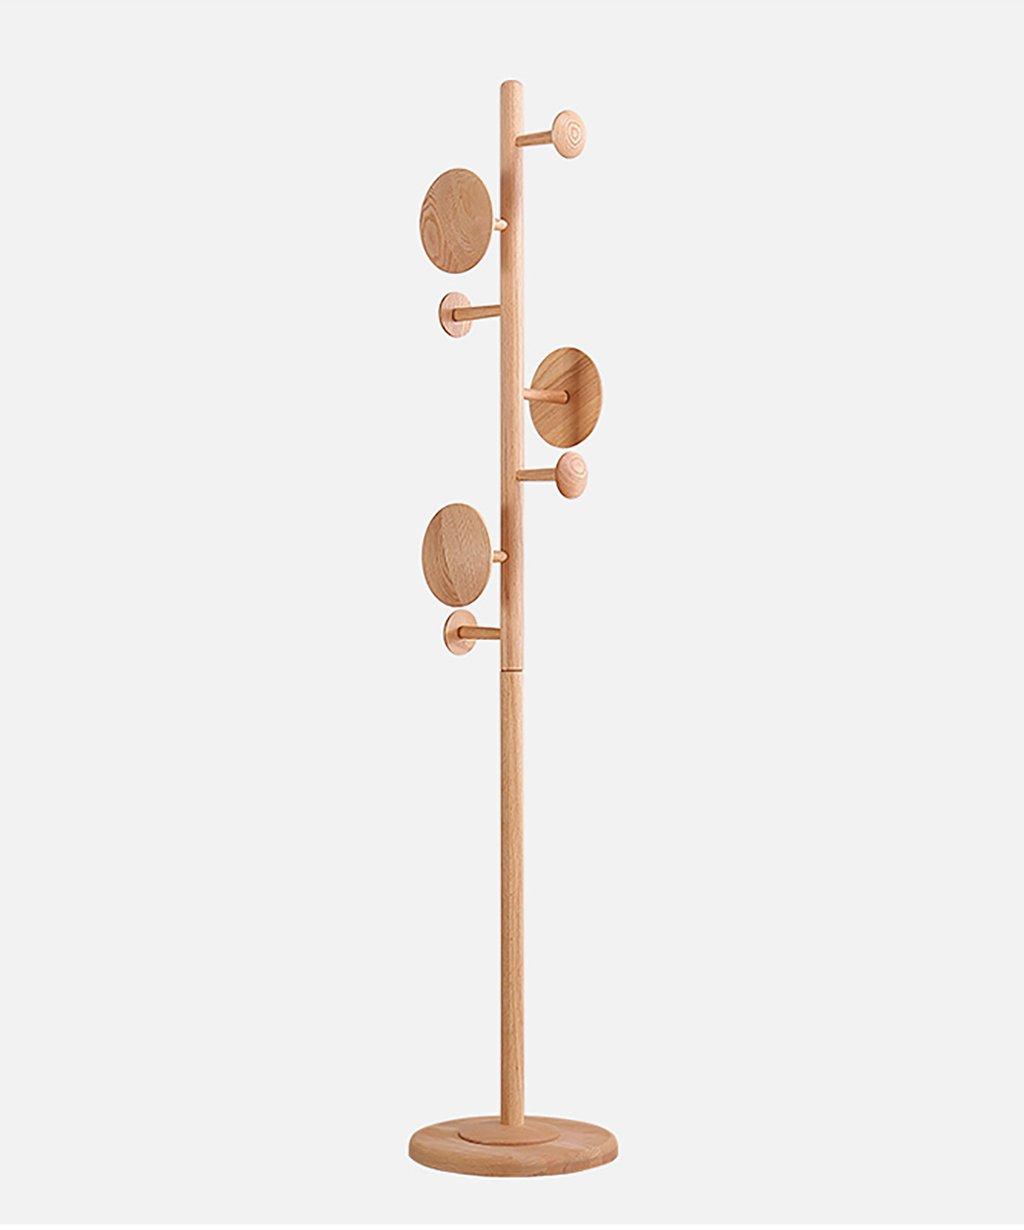 A QIANGDA Coat Hat Floor Standing Rack 7 Circular Hook, 3 Solid Wood Material 183cm Available (color   A)